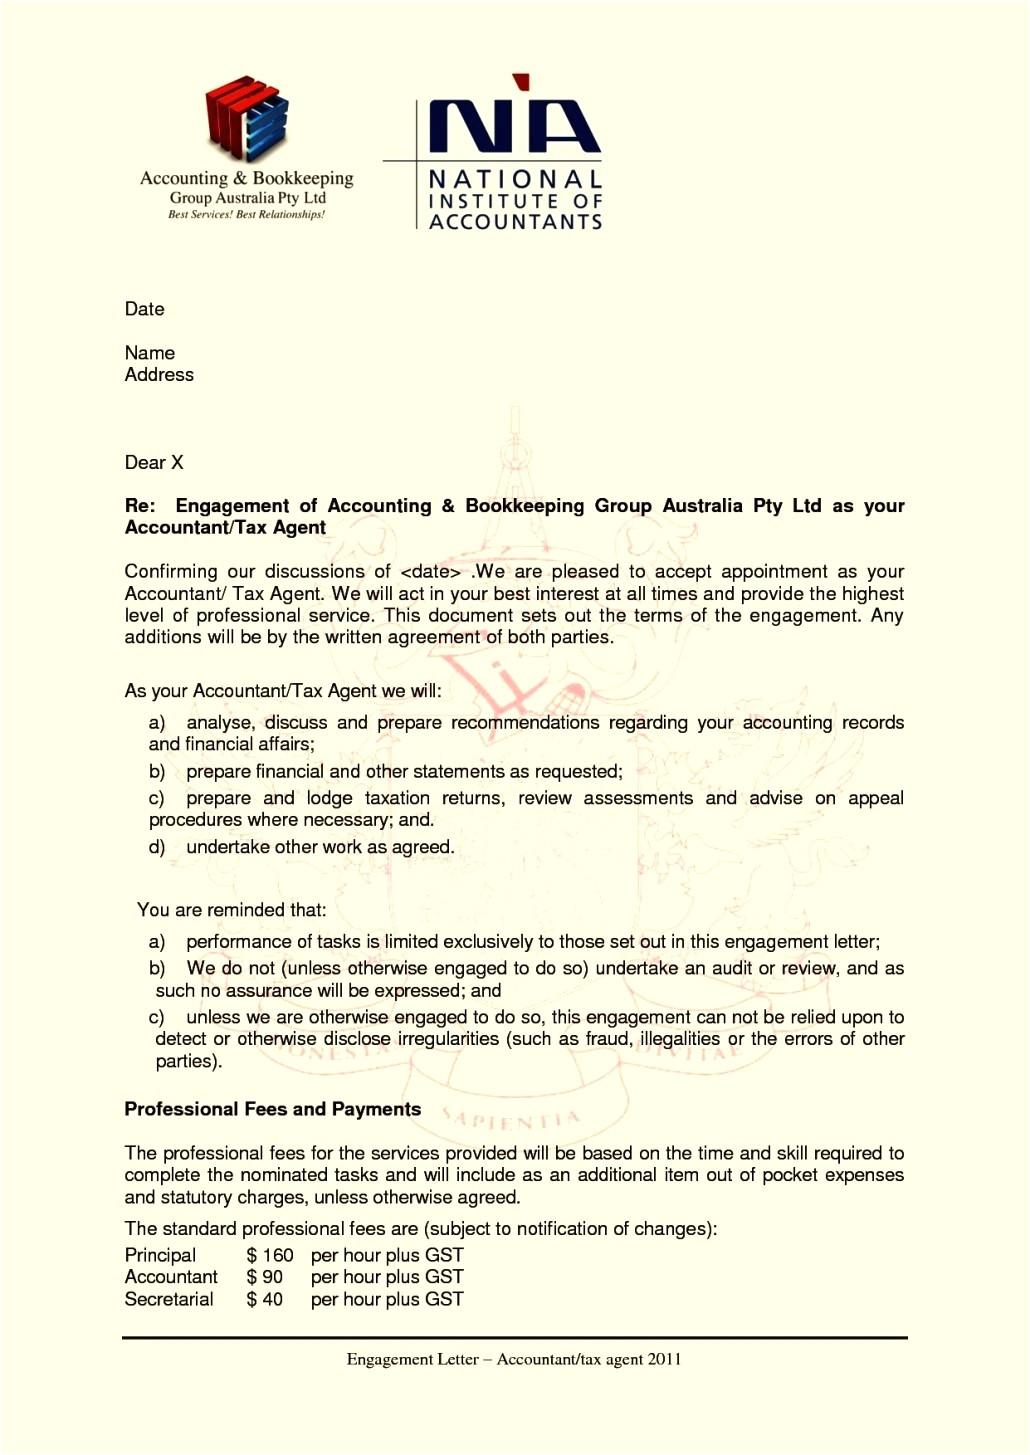 tax preparation engagement letter template